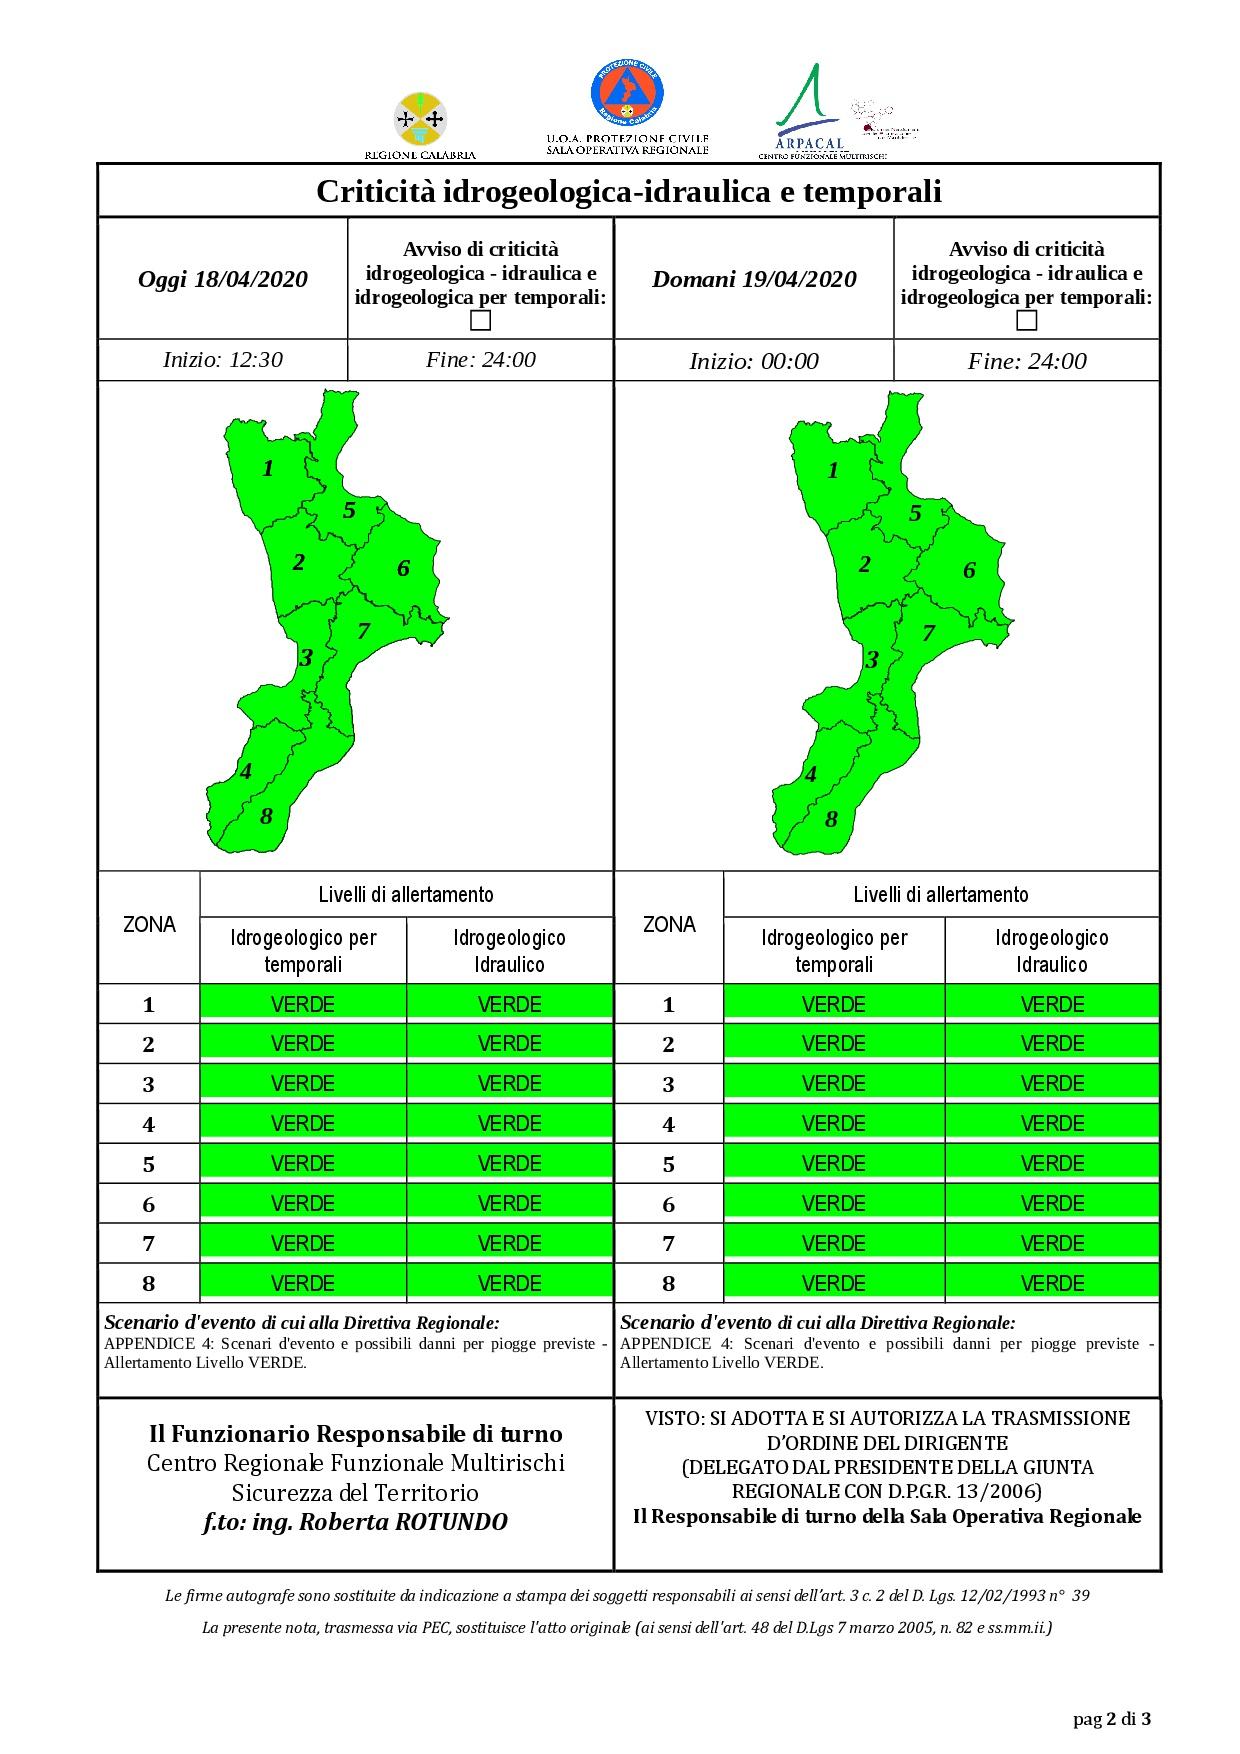 Criticità idrogeologica-idraulica e temporali in Calabria 18-04-2020